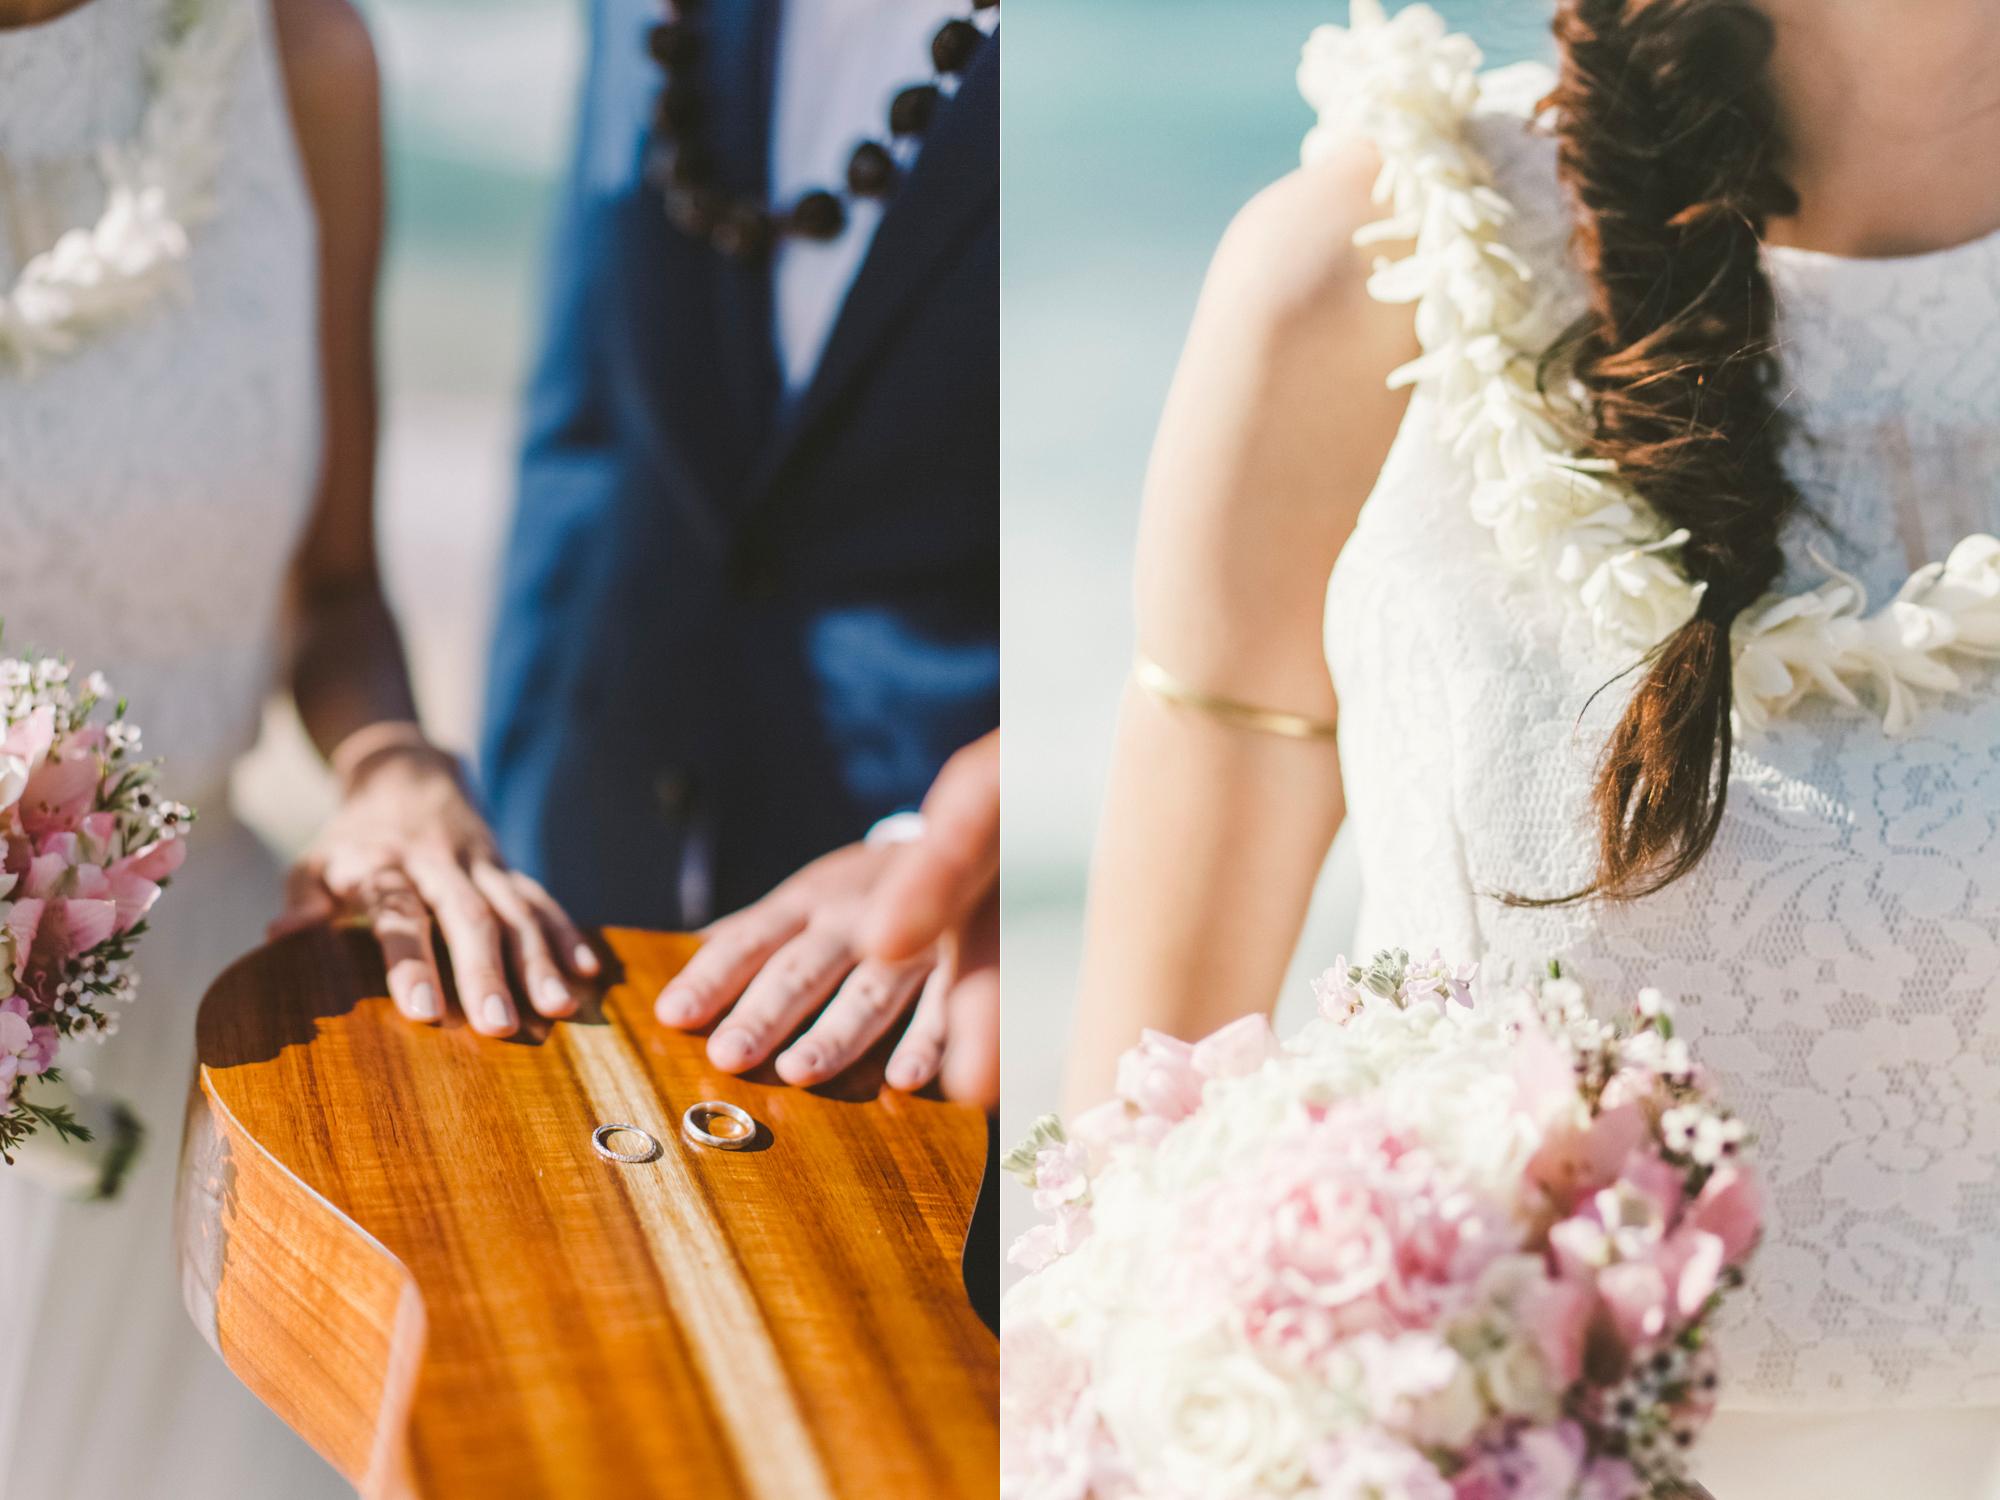 angie-diaz-photography-maui-wedding-ironwoods-beach-14.jpg